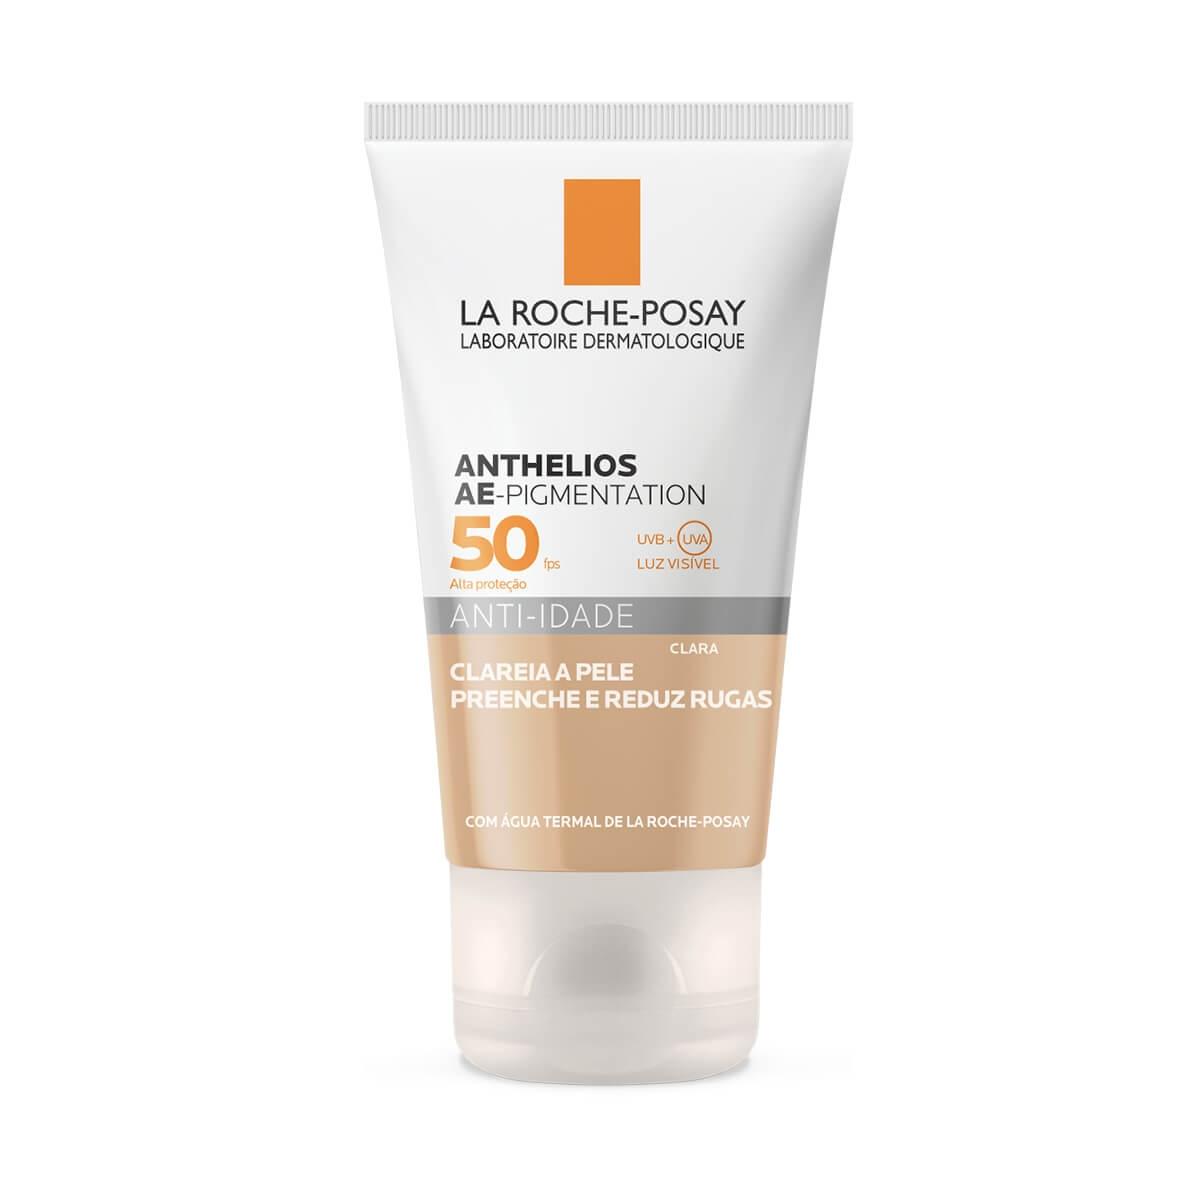 Protetor Solar Facial La Roche-Posay Anthelios AE-Pigmentation Cor Clara FPS 50 com 40g 40g